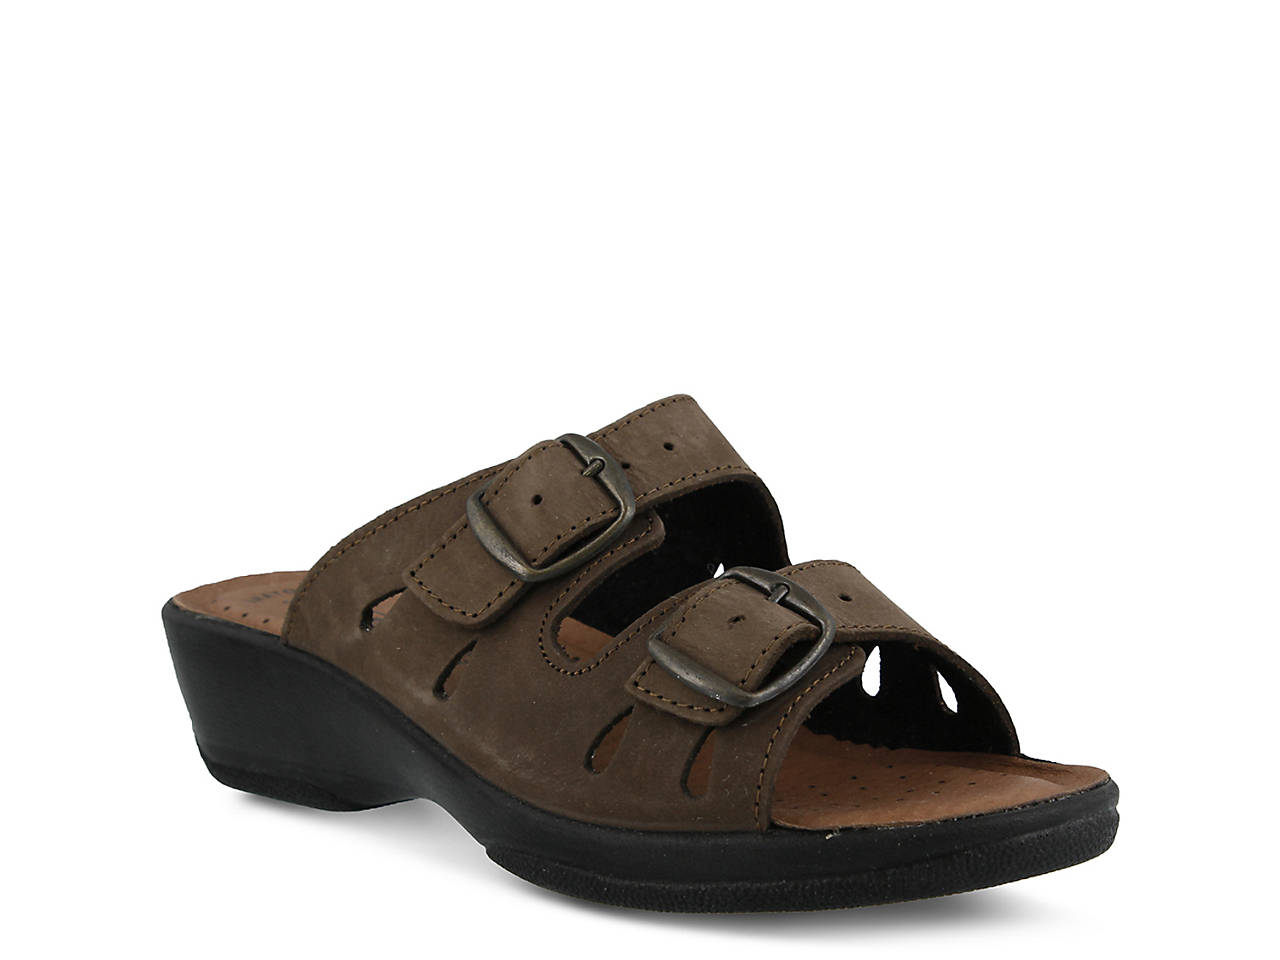 930e63079a4a Flexus by Spring Step Decca Wedge Sandal Women s Shoes